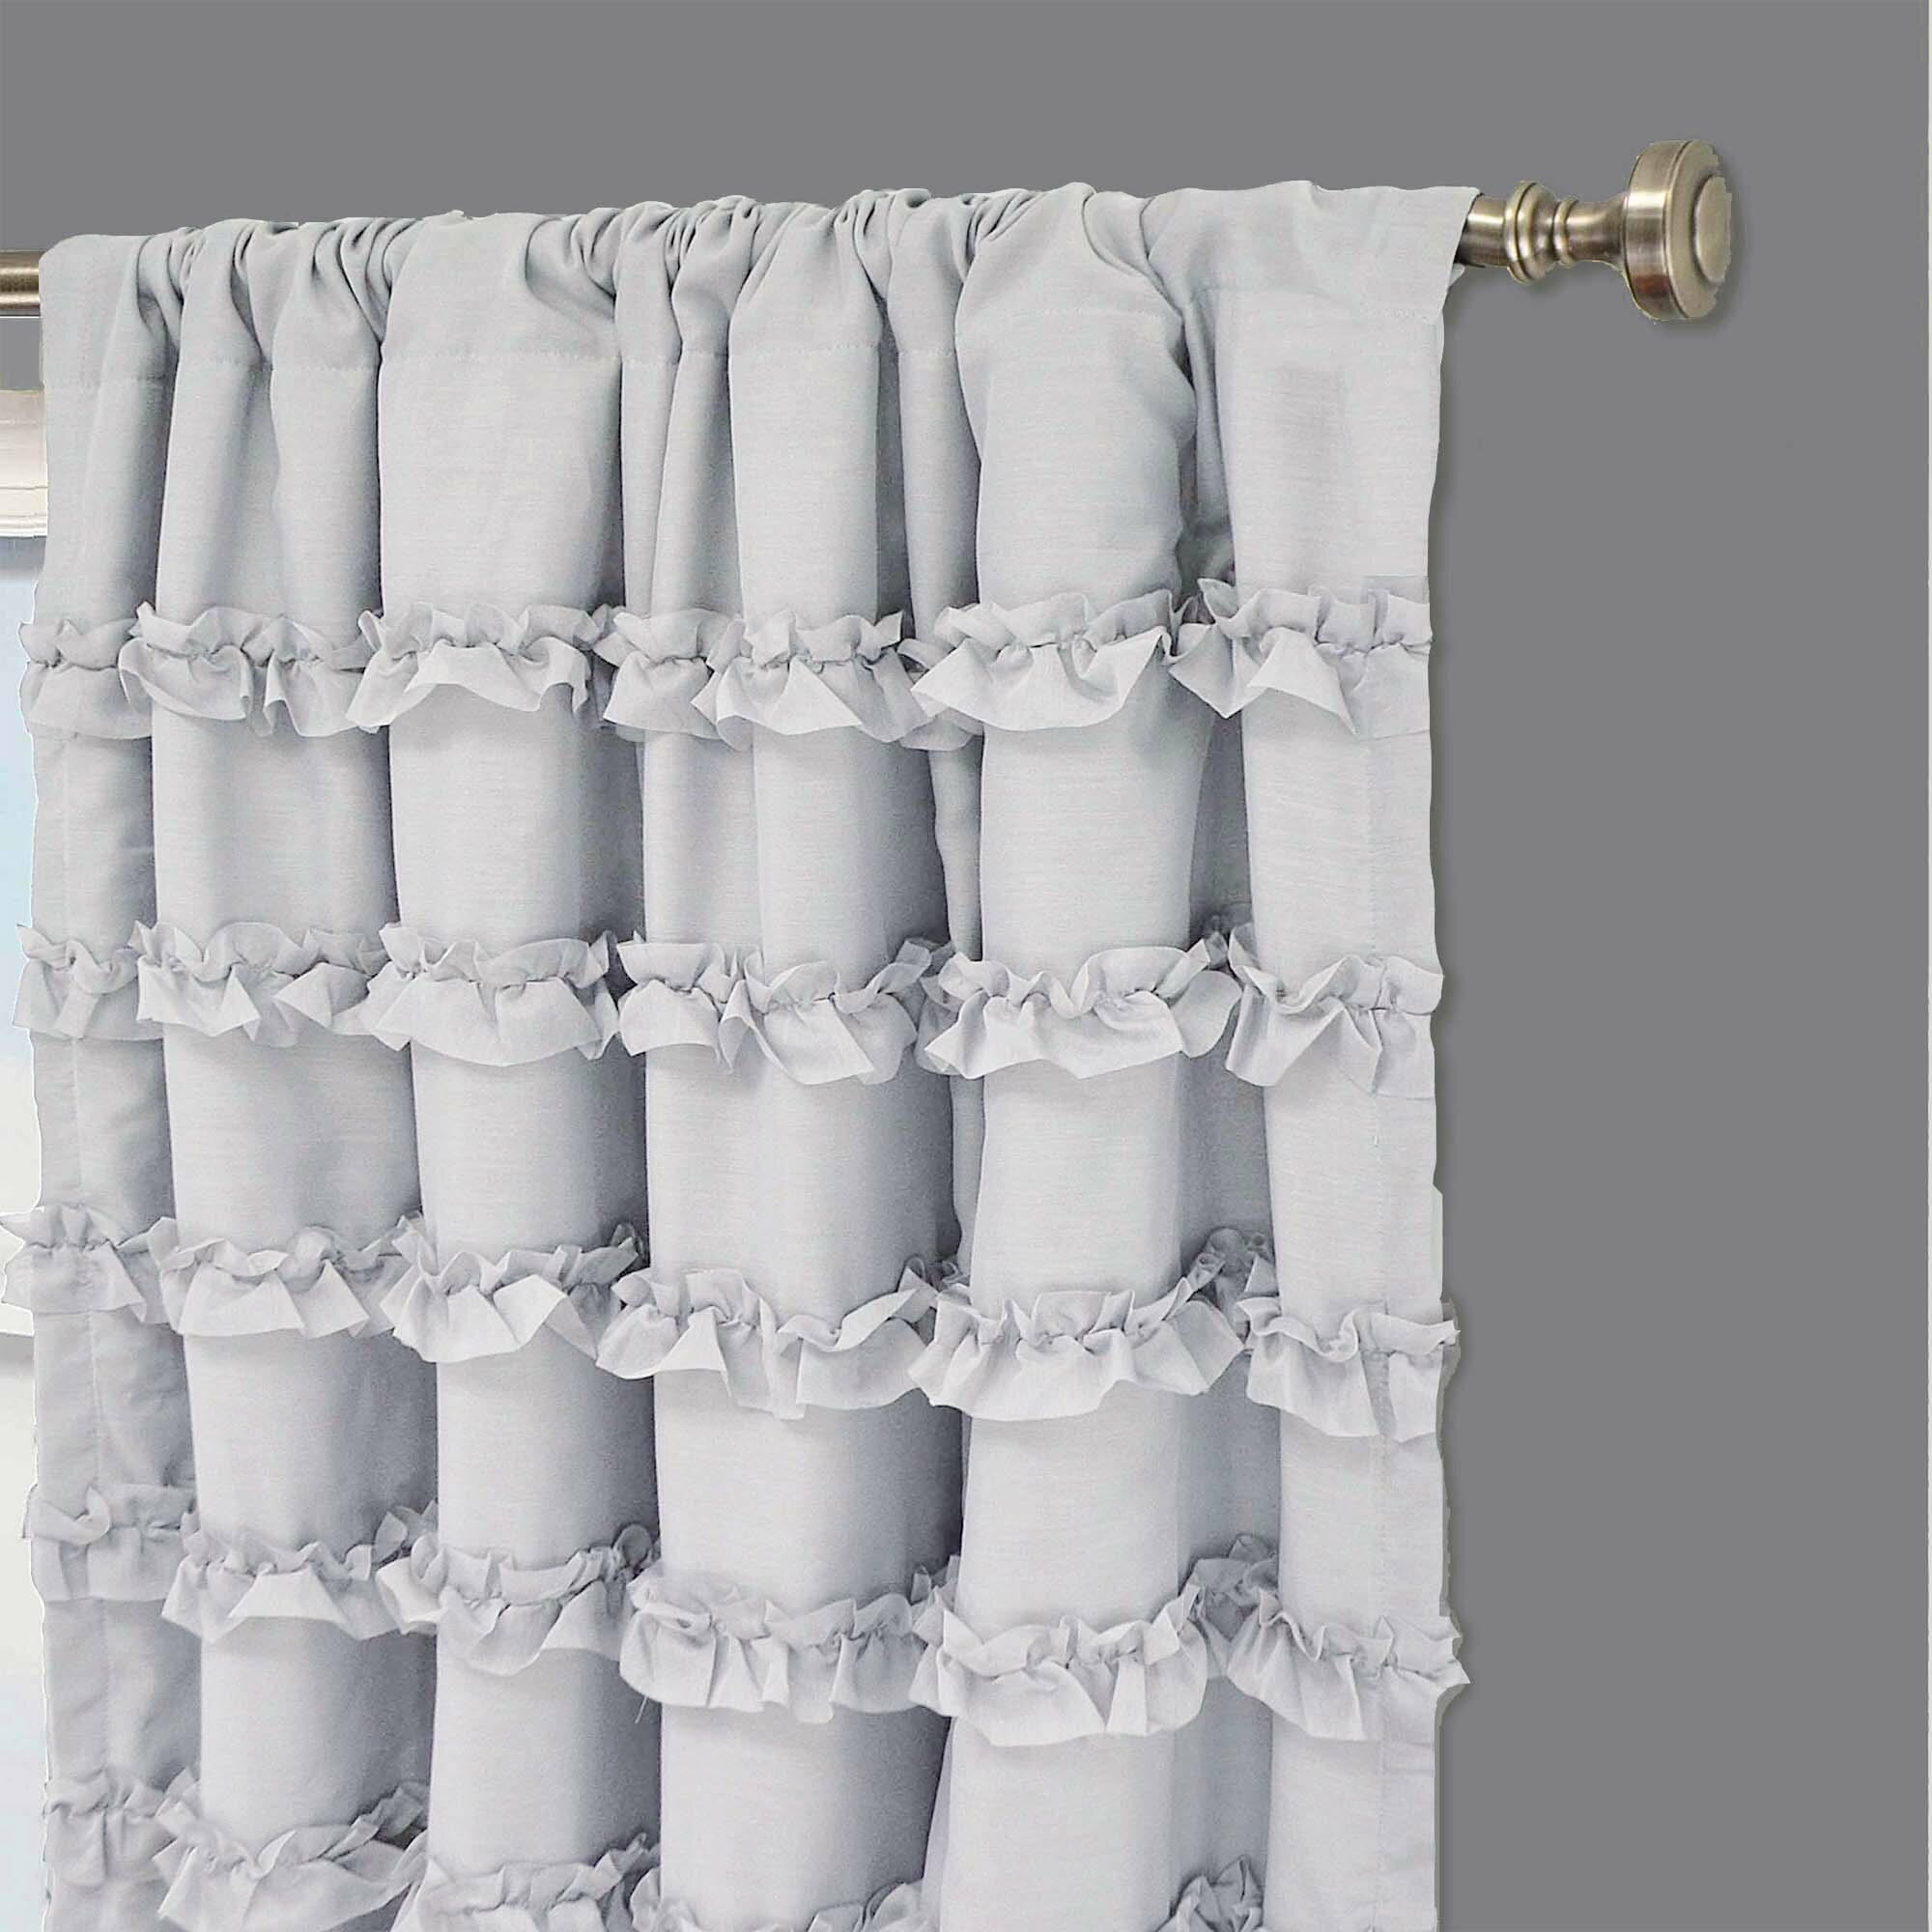 Black ruffle curtains - Rayna Ruffle Blackout Single Curtain Panel